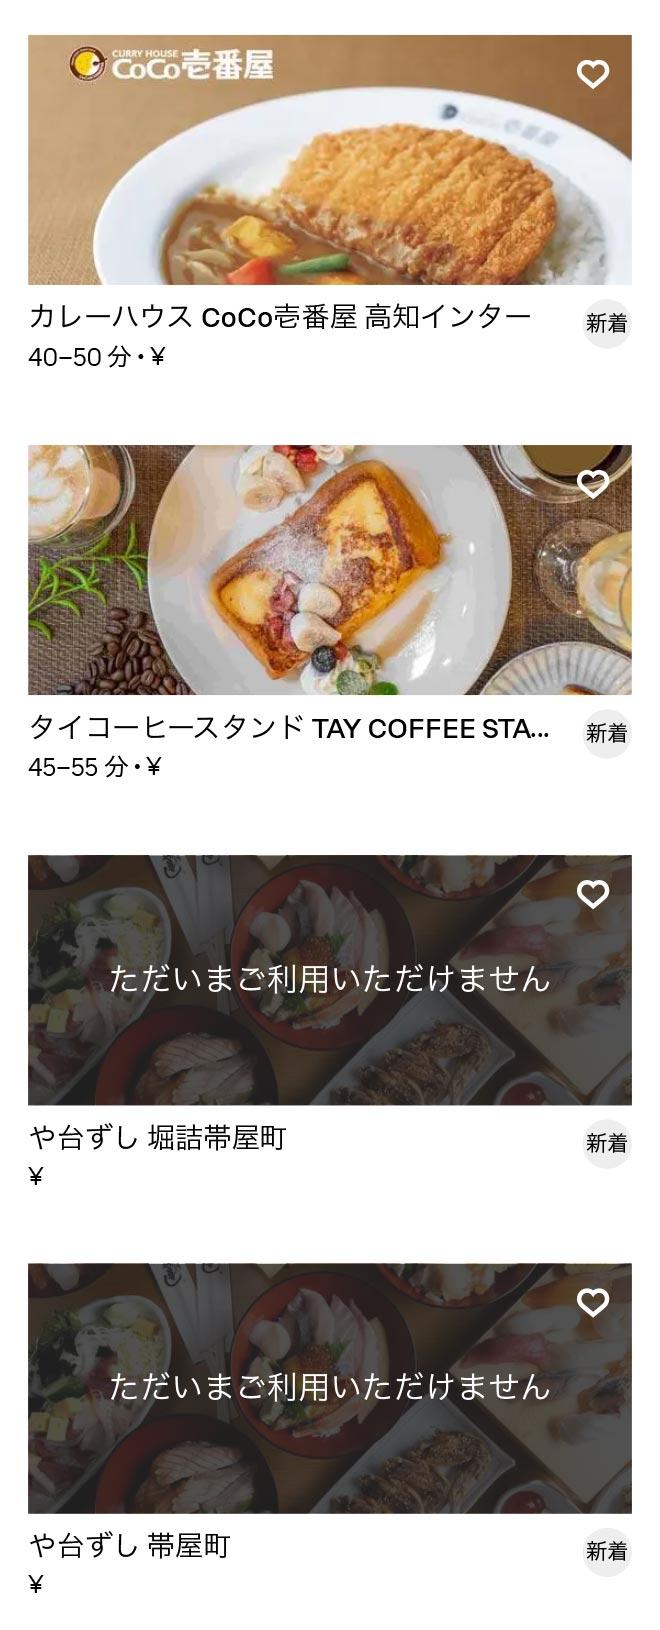 Kouchi menu 2010 05